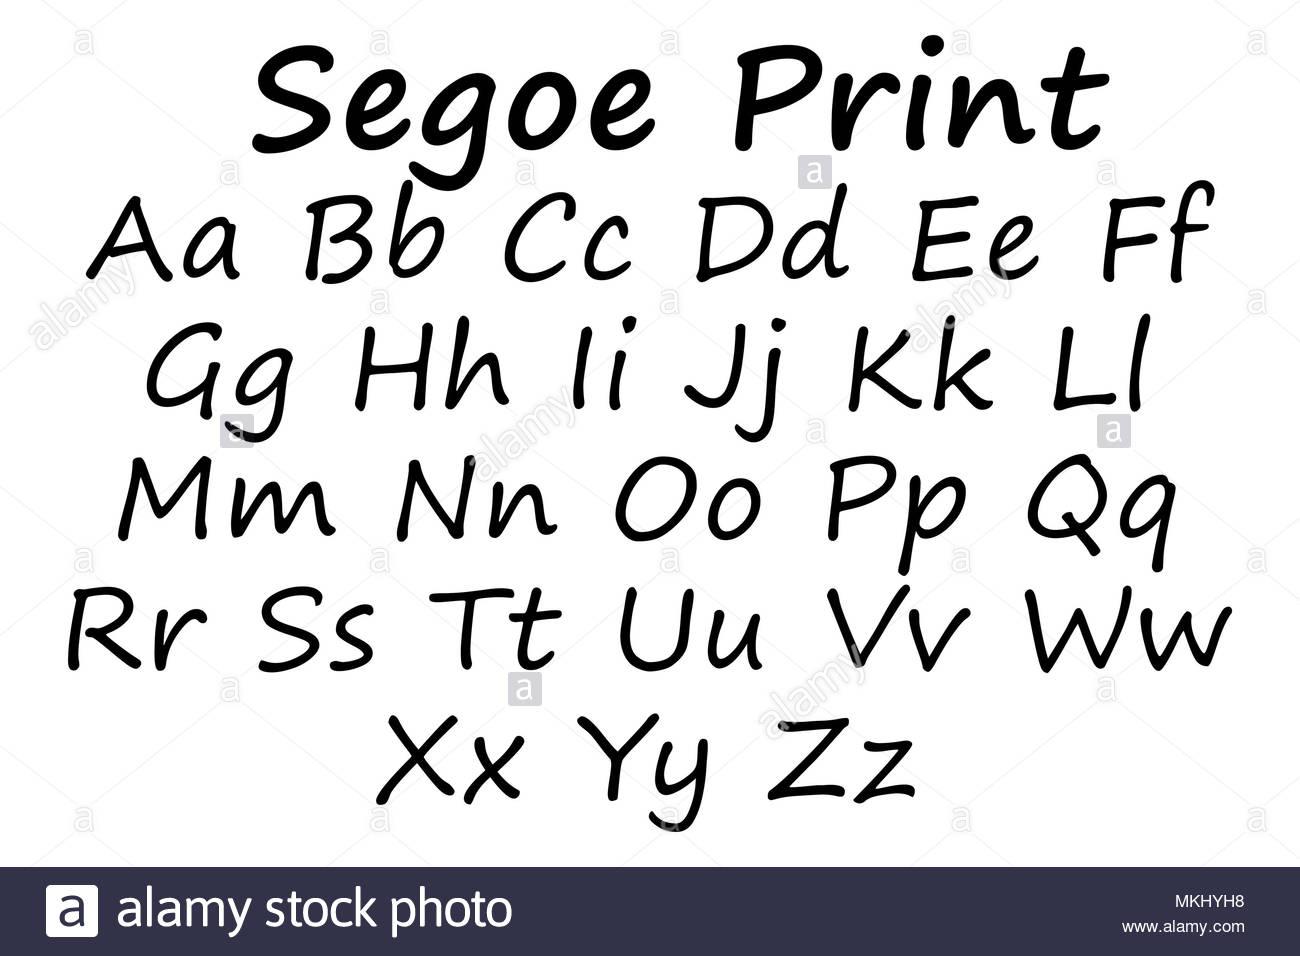 Segoe print font Stock Photo: 184176980 - Alamy